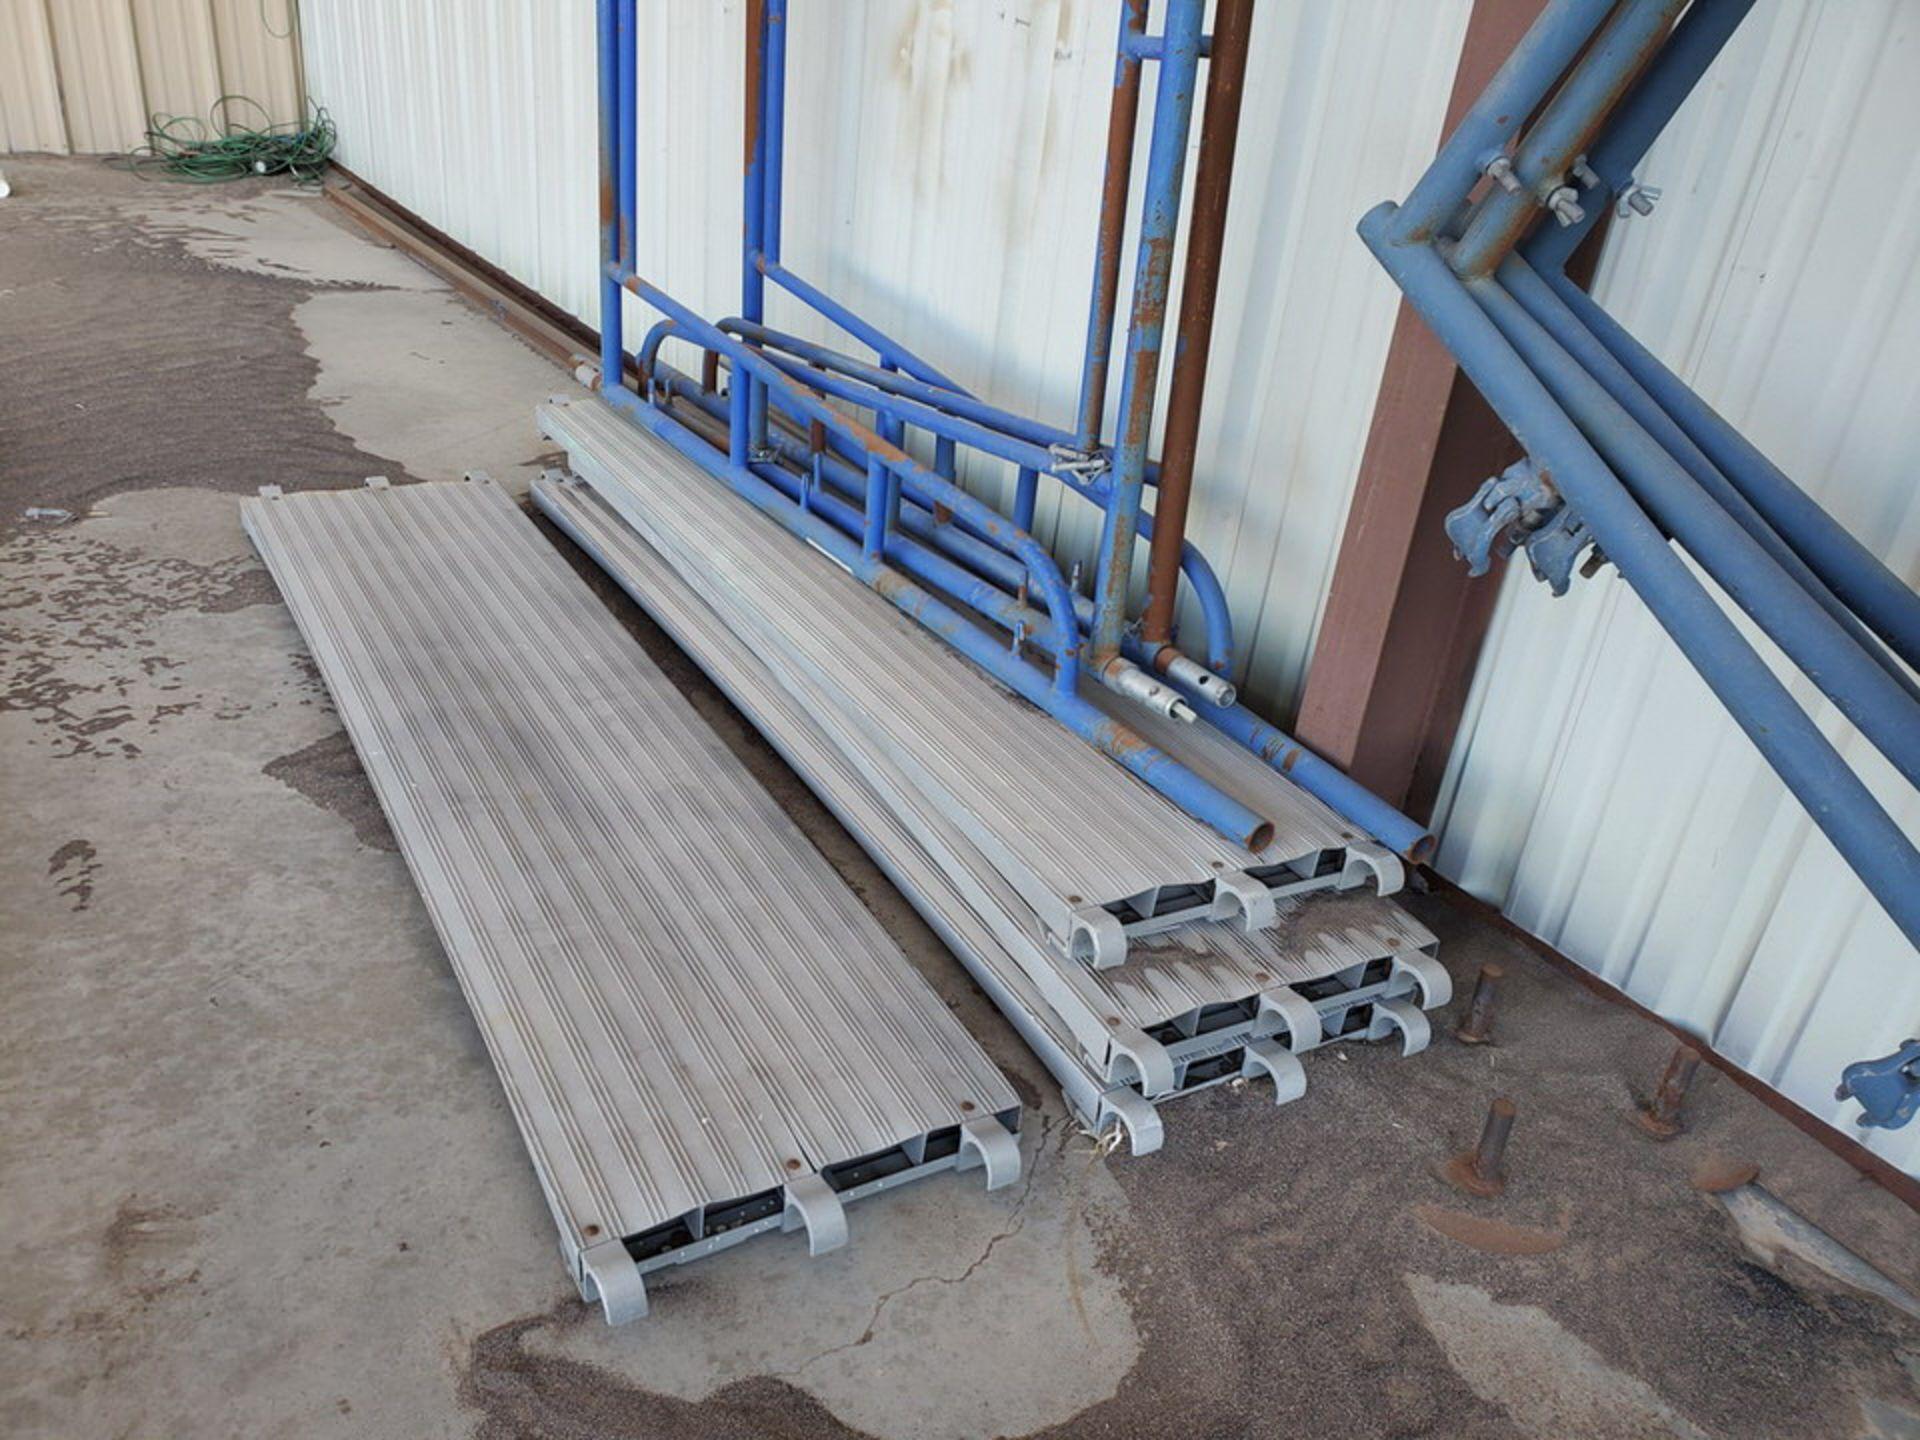 Scaffold W' 16' Fixed Alum. Ladder - Image 9 of 10